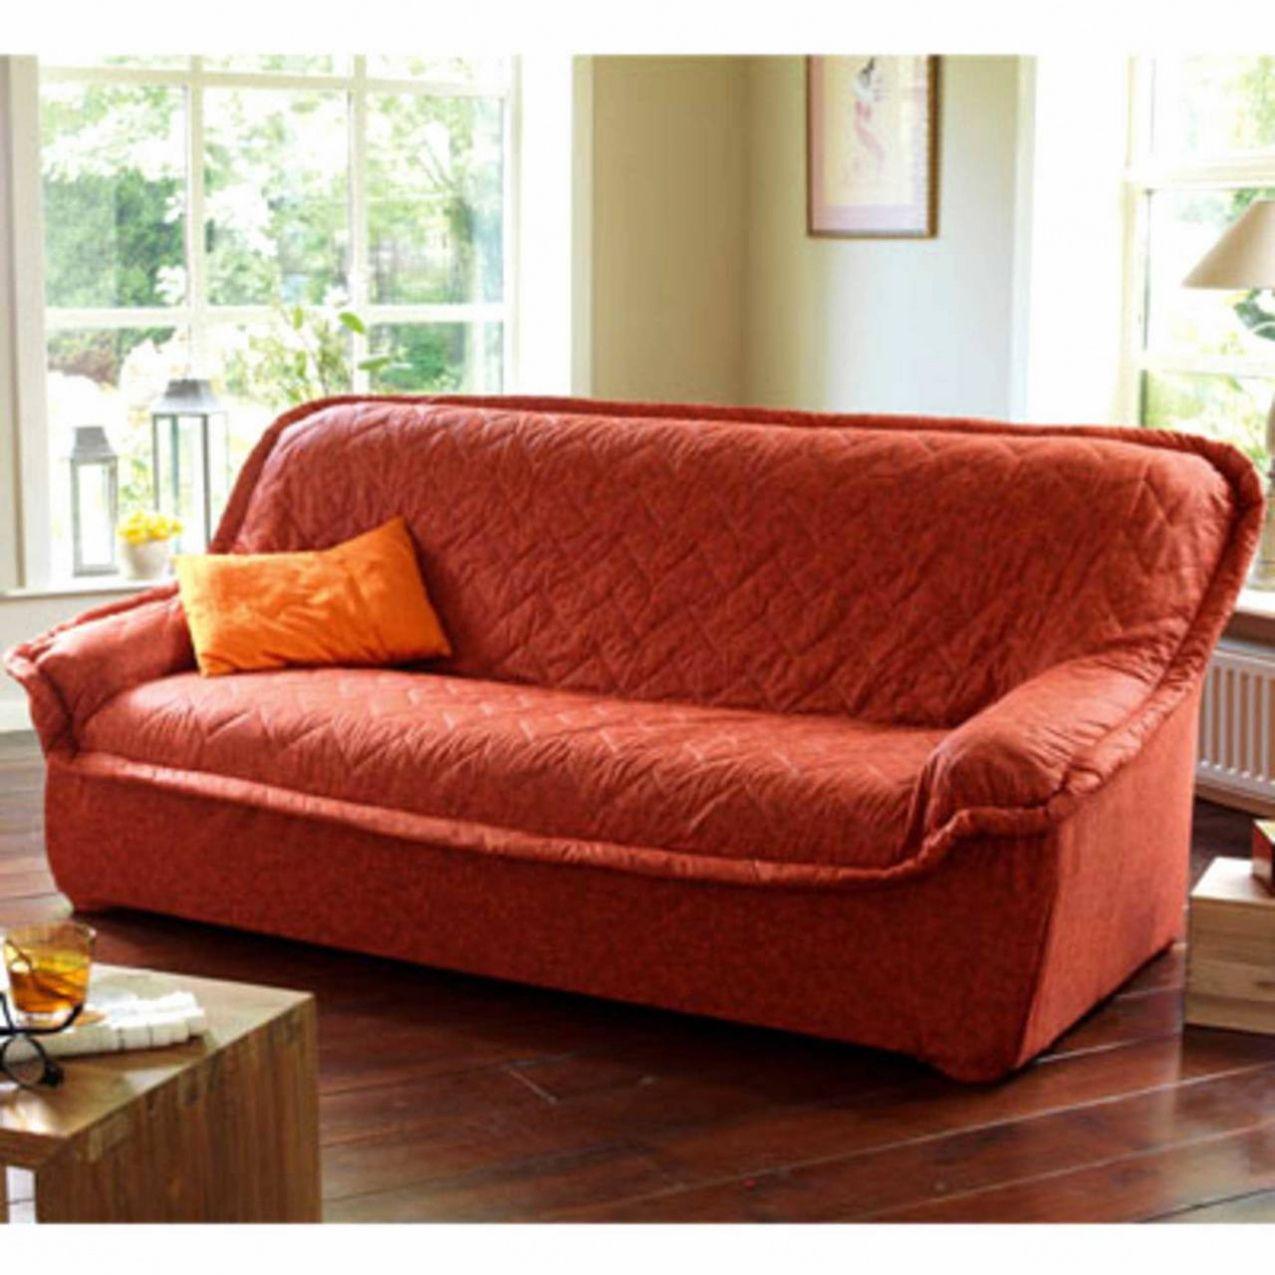 70 Canape D Angle Convertible Poltronesofa 2017 Home Decor Furniture Decor